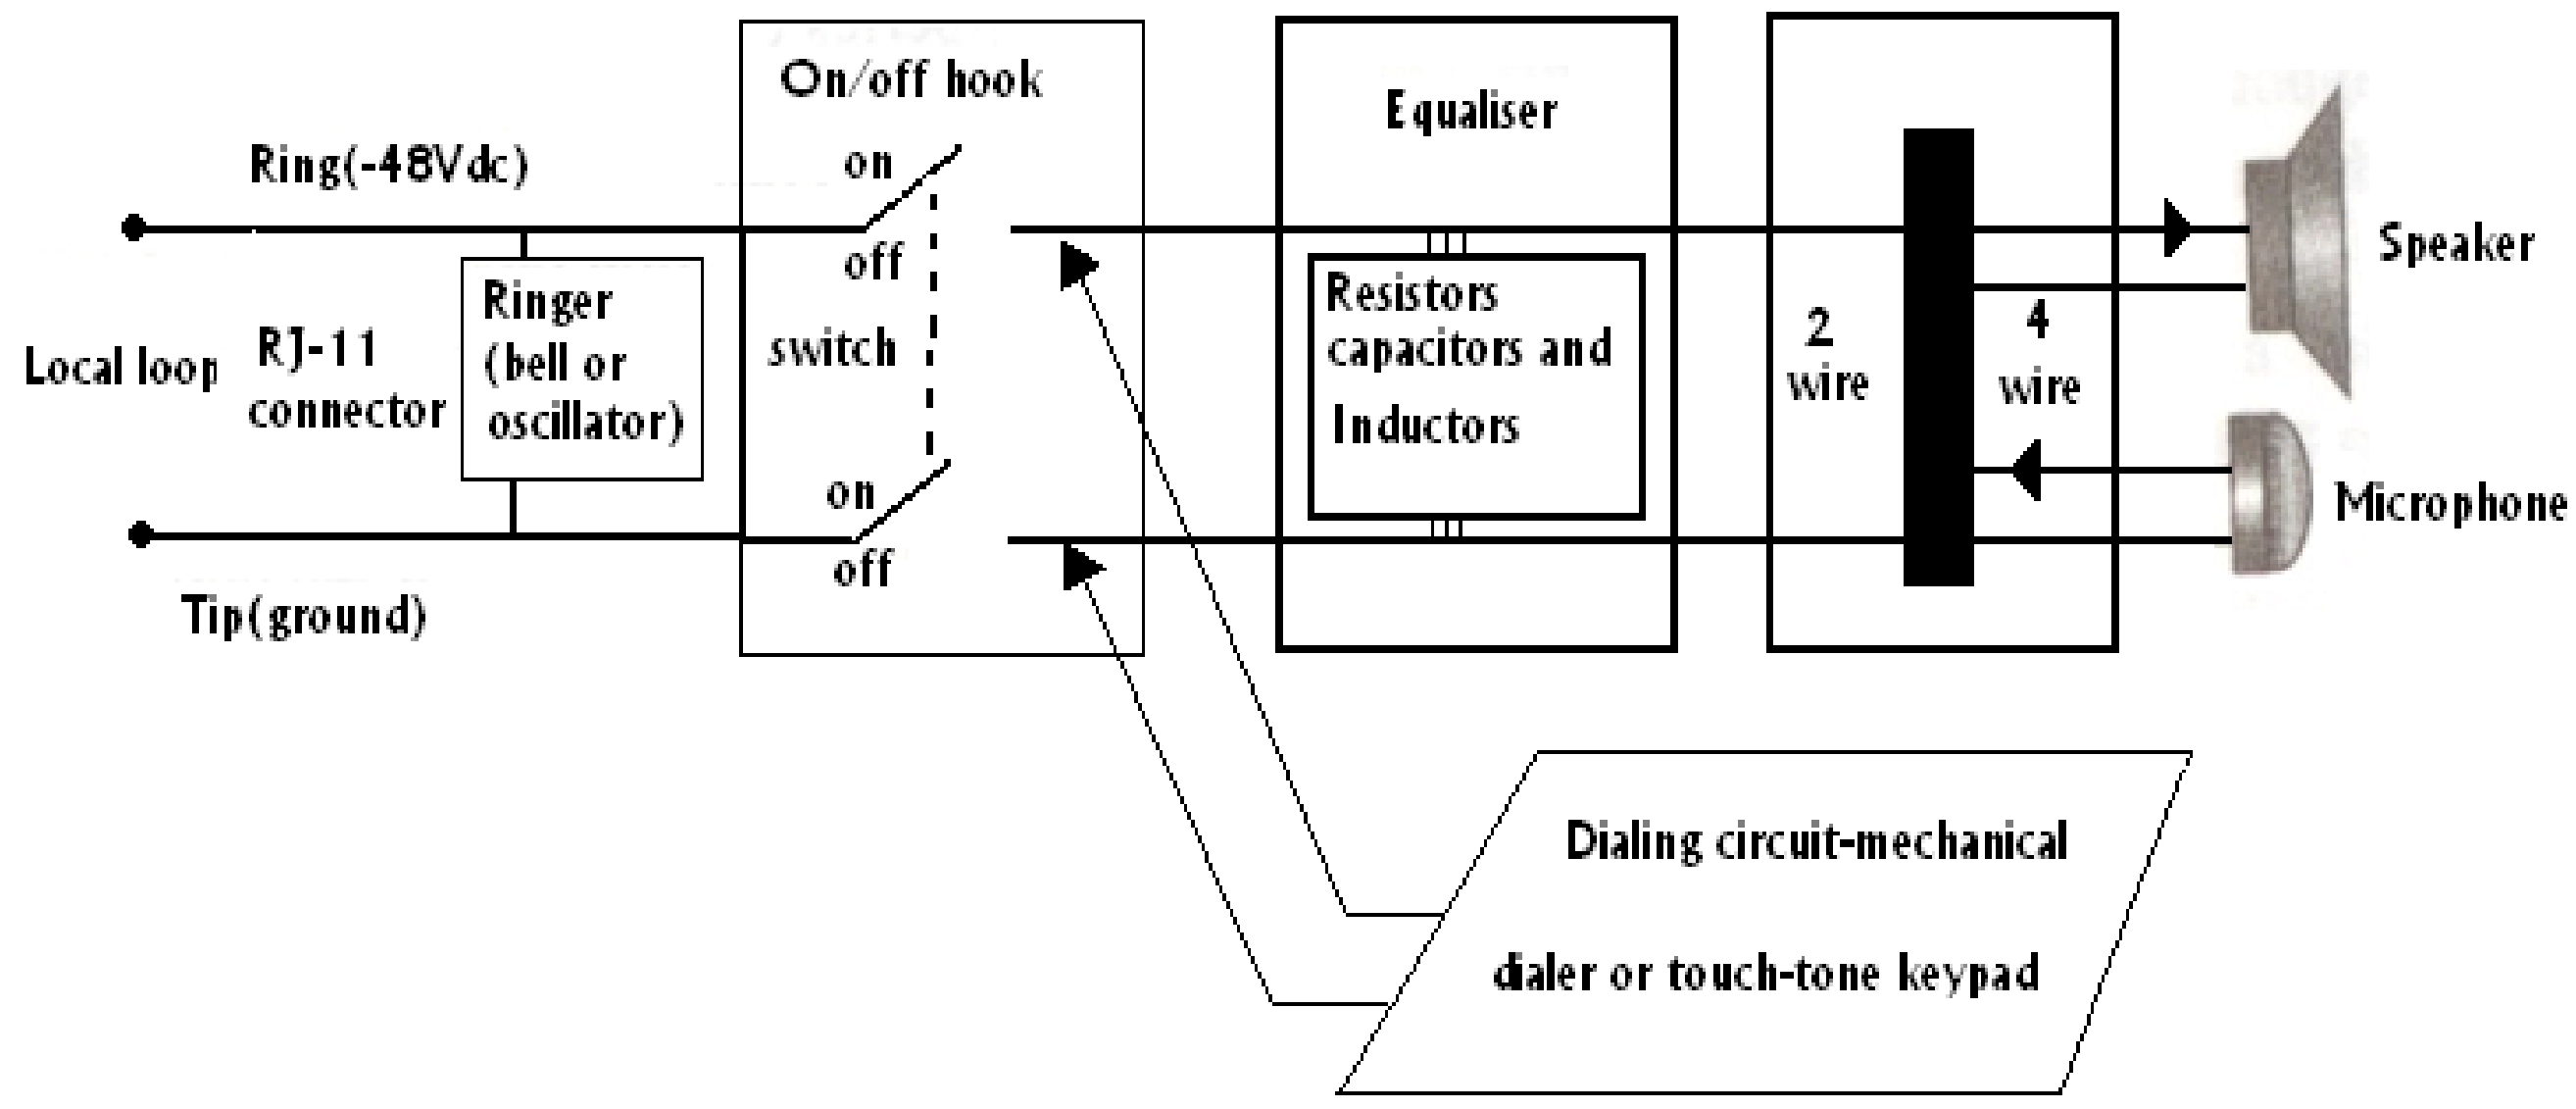 th3210d1004 wiring diagram old furnace wiring diagram